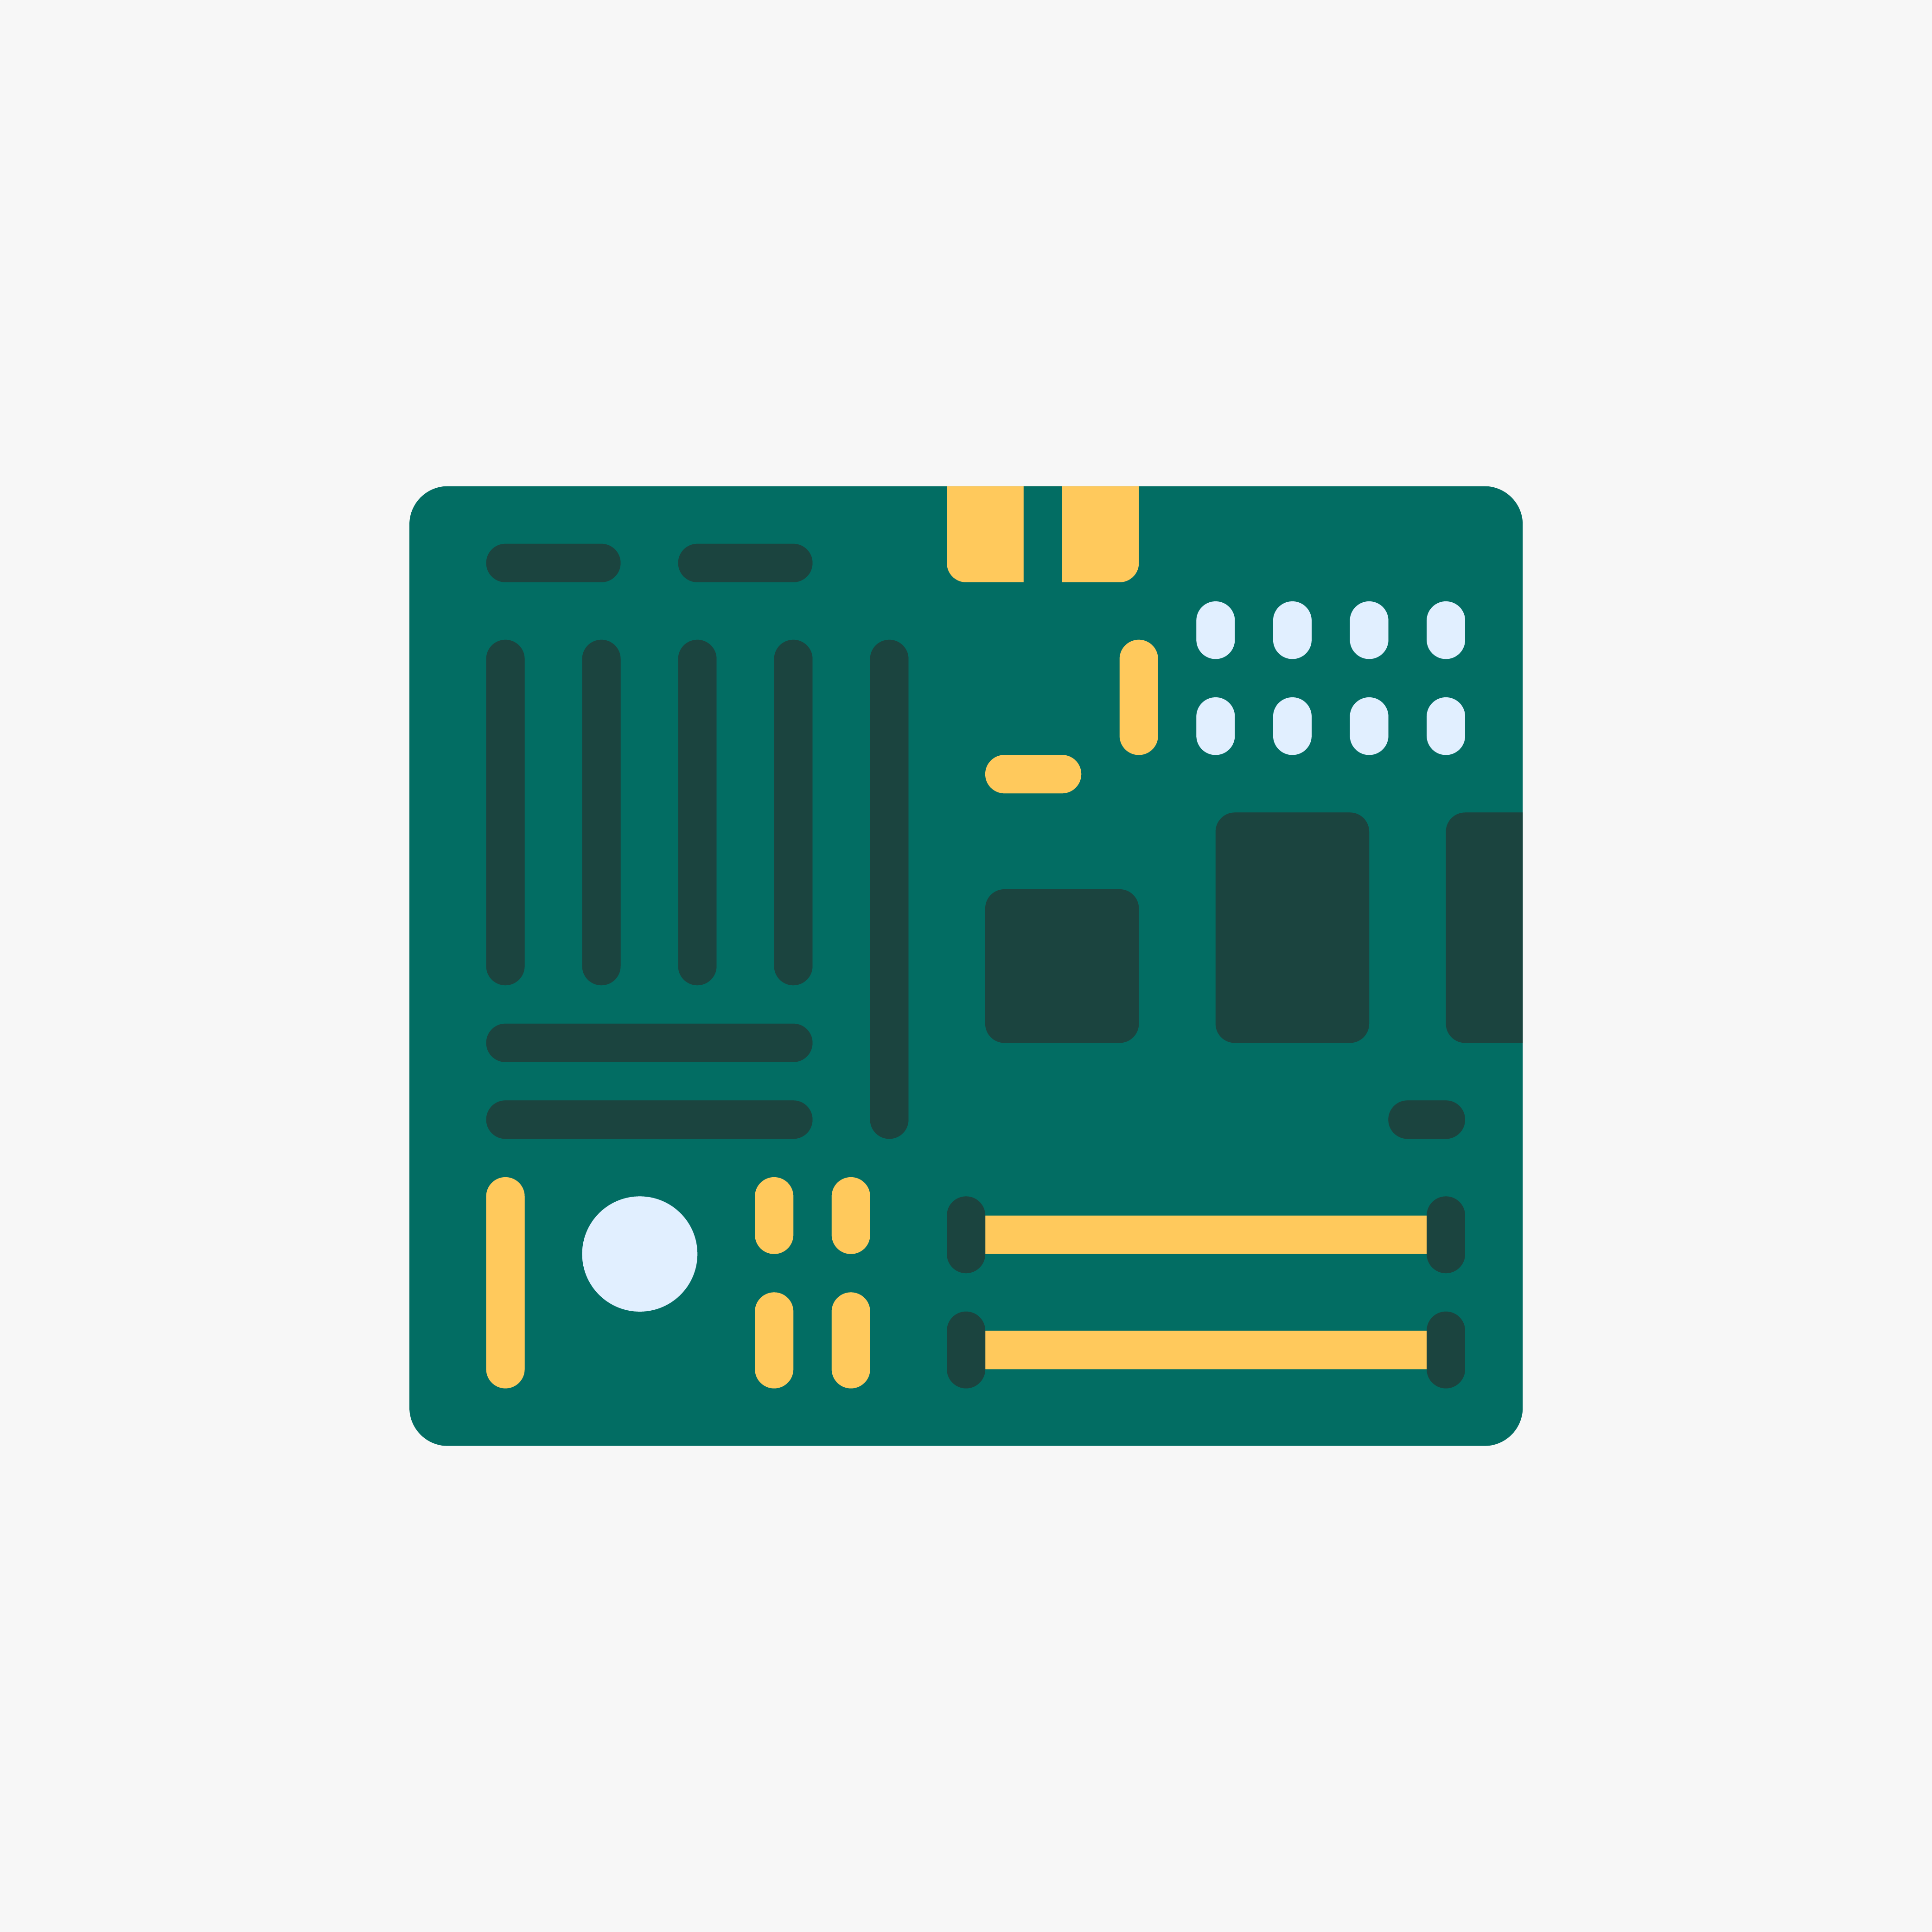 MEMORY DDR4333-E512/SE 512MB 400MHZ CL3 ECC UNBUFFERRED PC3200U-30330-B1